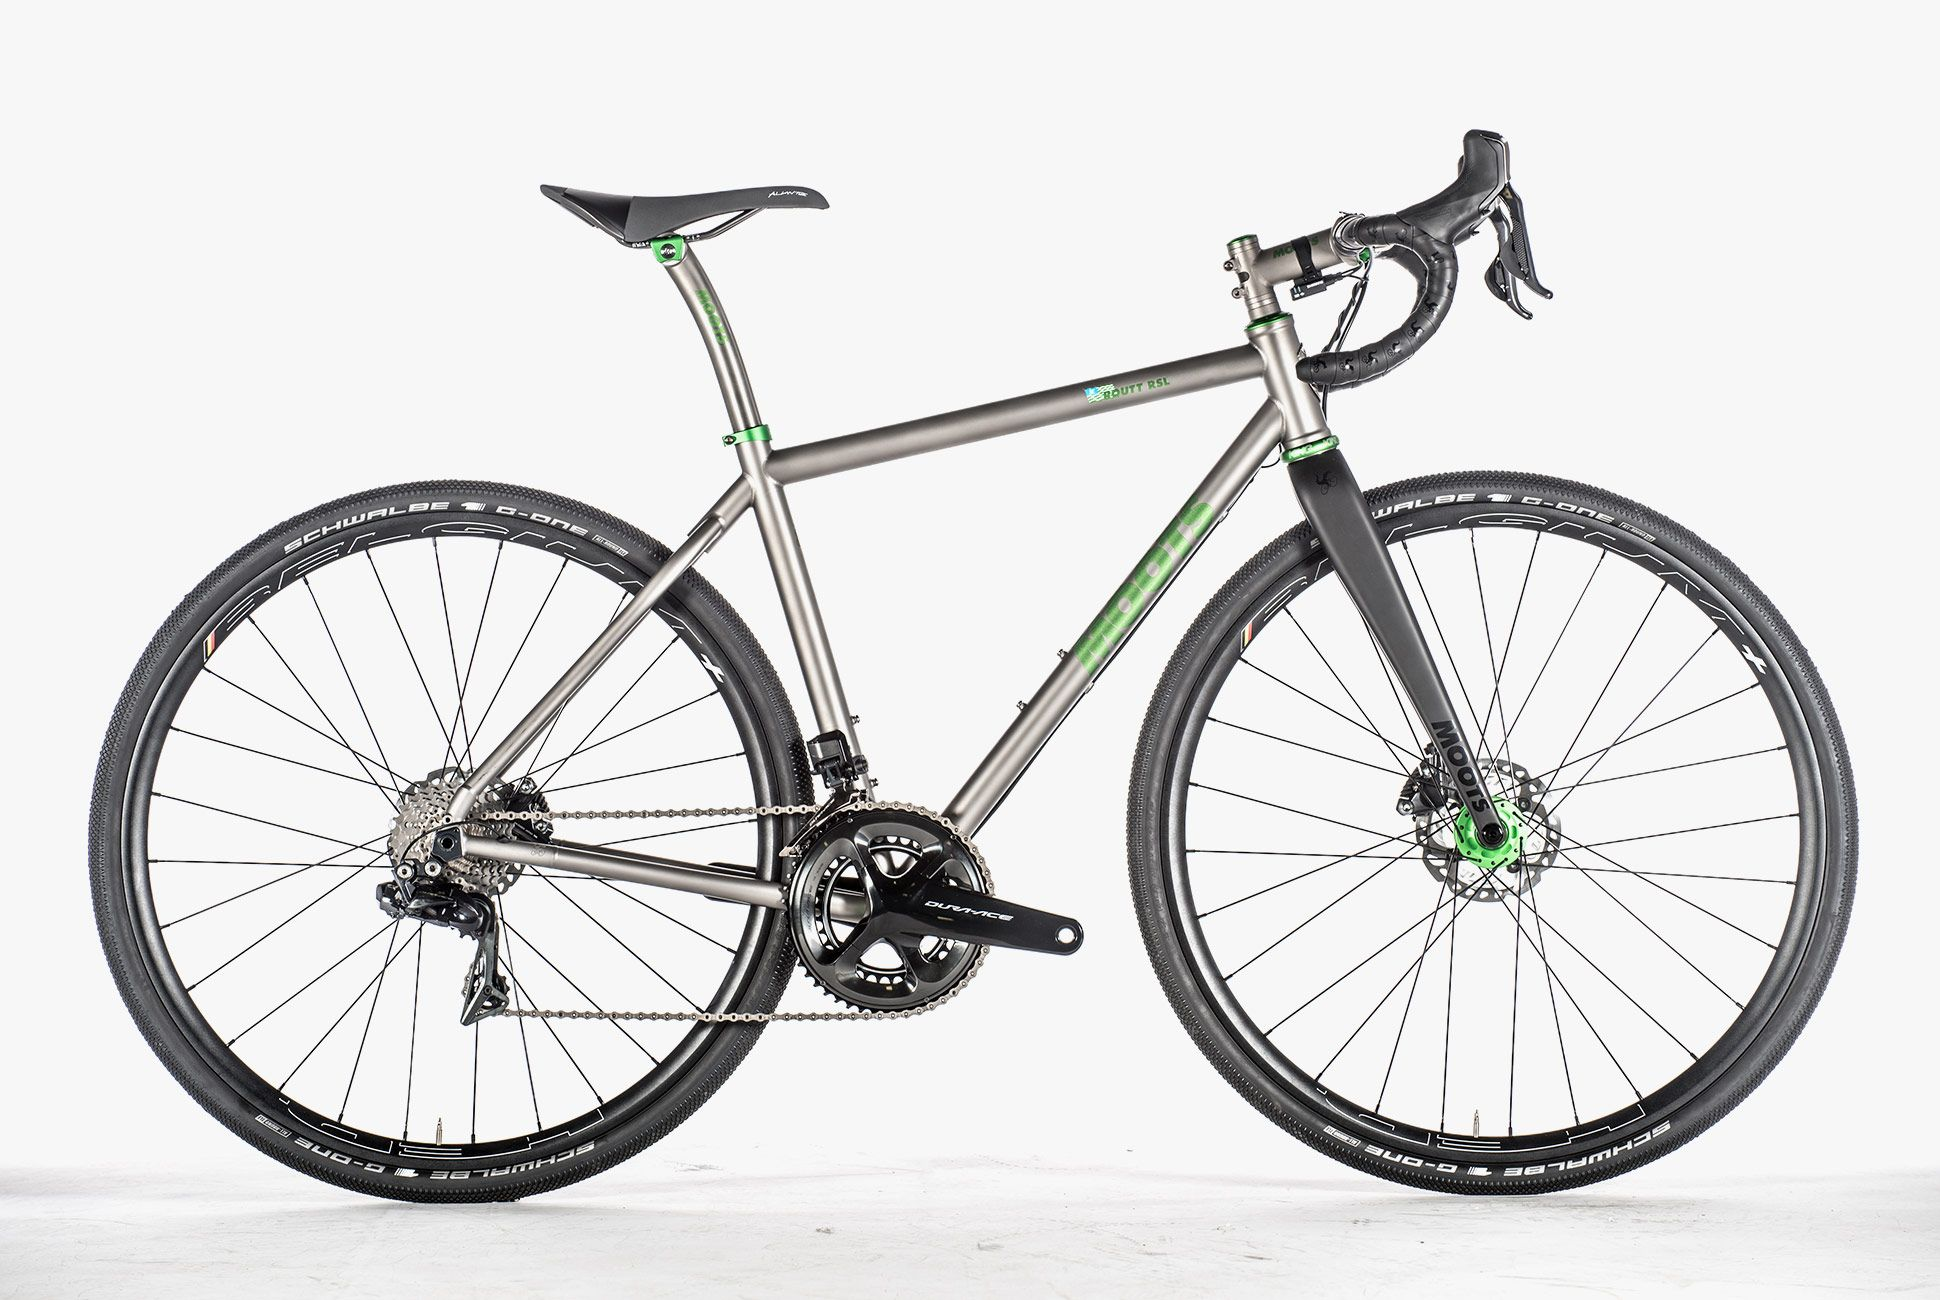 Bikes-From-NAHBS-Gear-Patrol-28